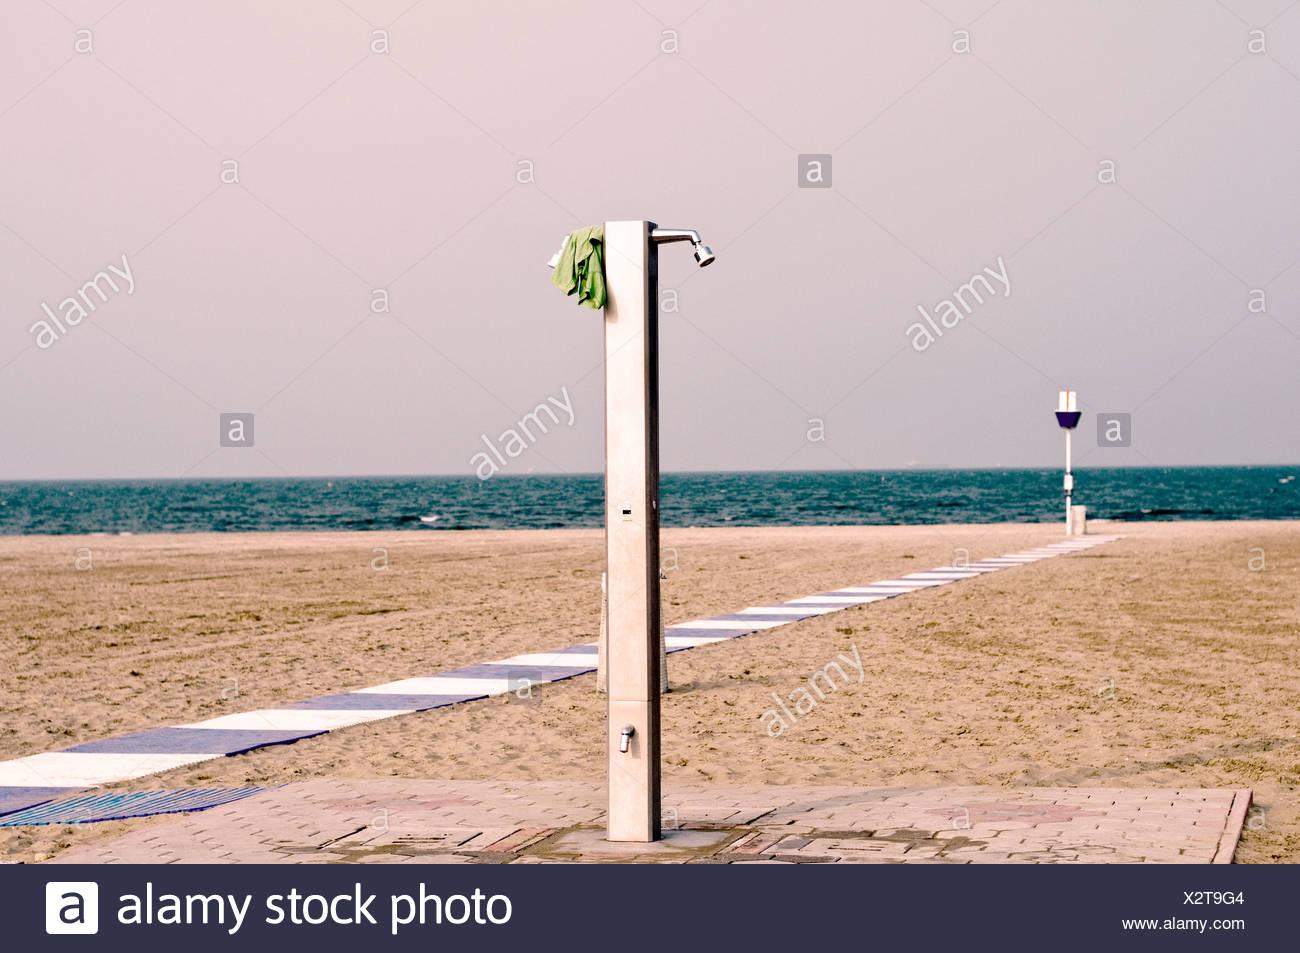 Ducha en la playa de arena de Lido di Venezia, Italia, Europa Foto de stock